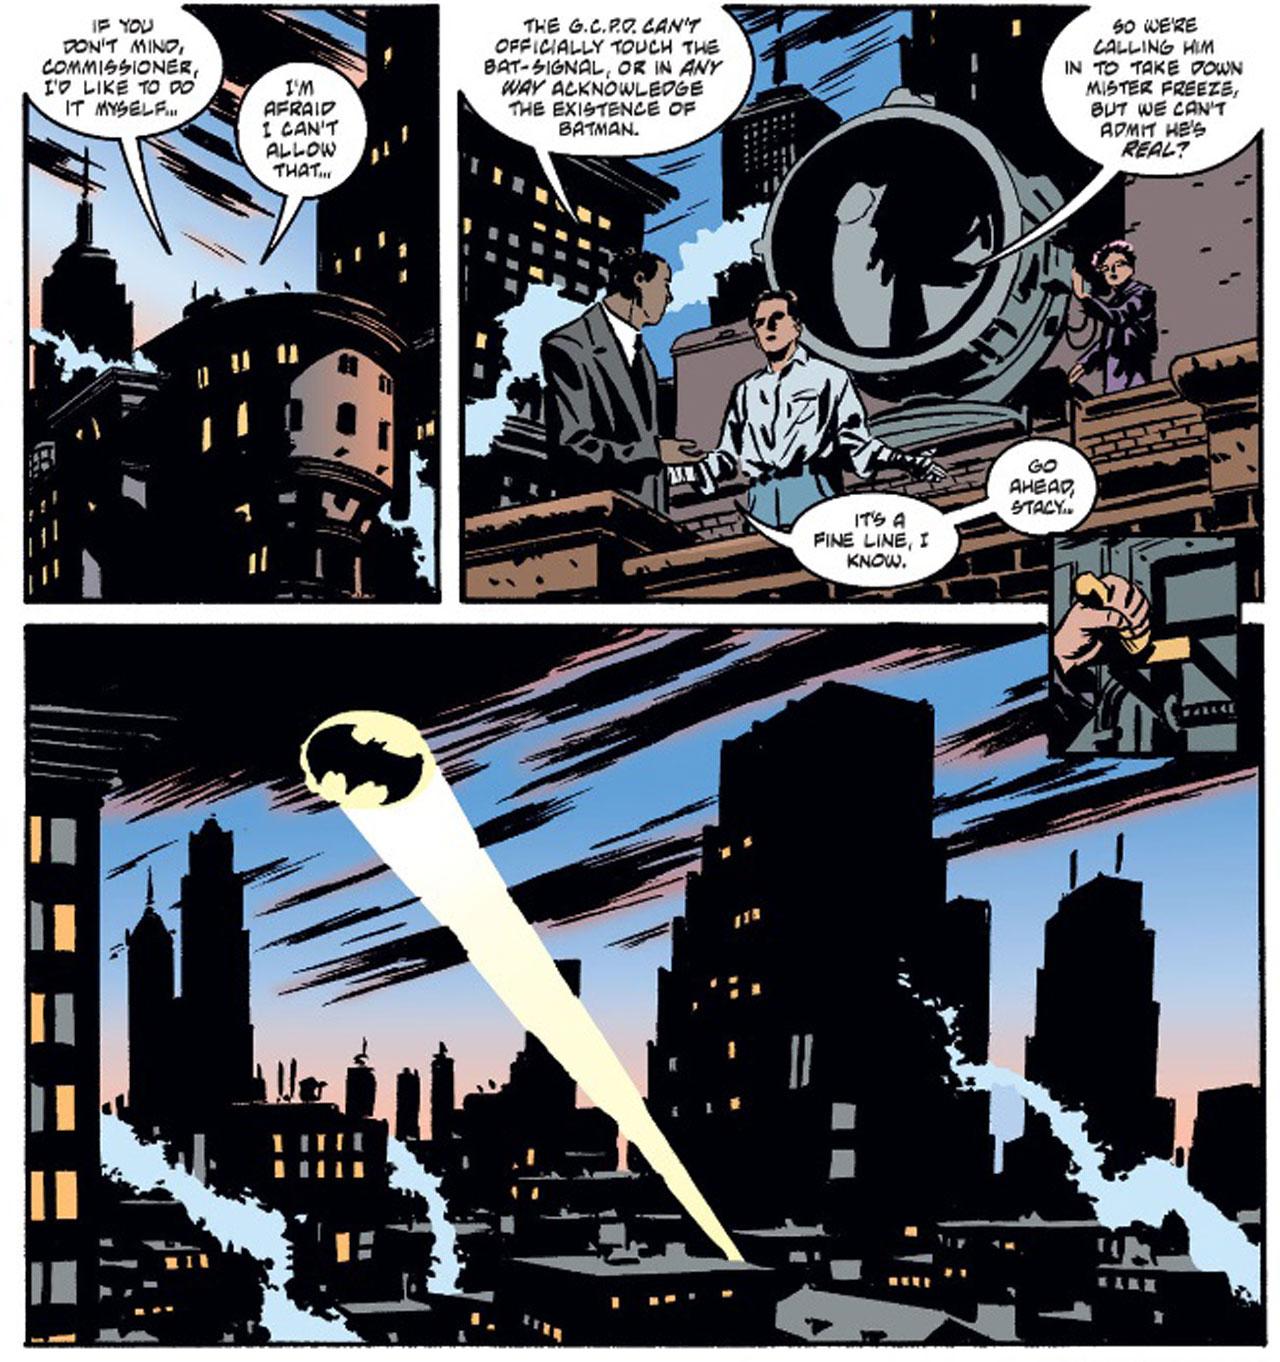 Gotham-Central-2.jpg